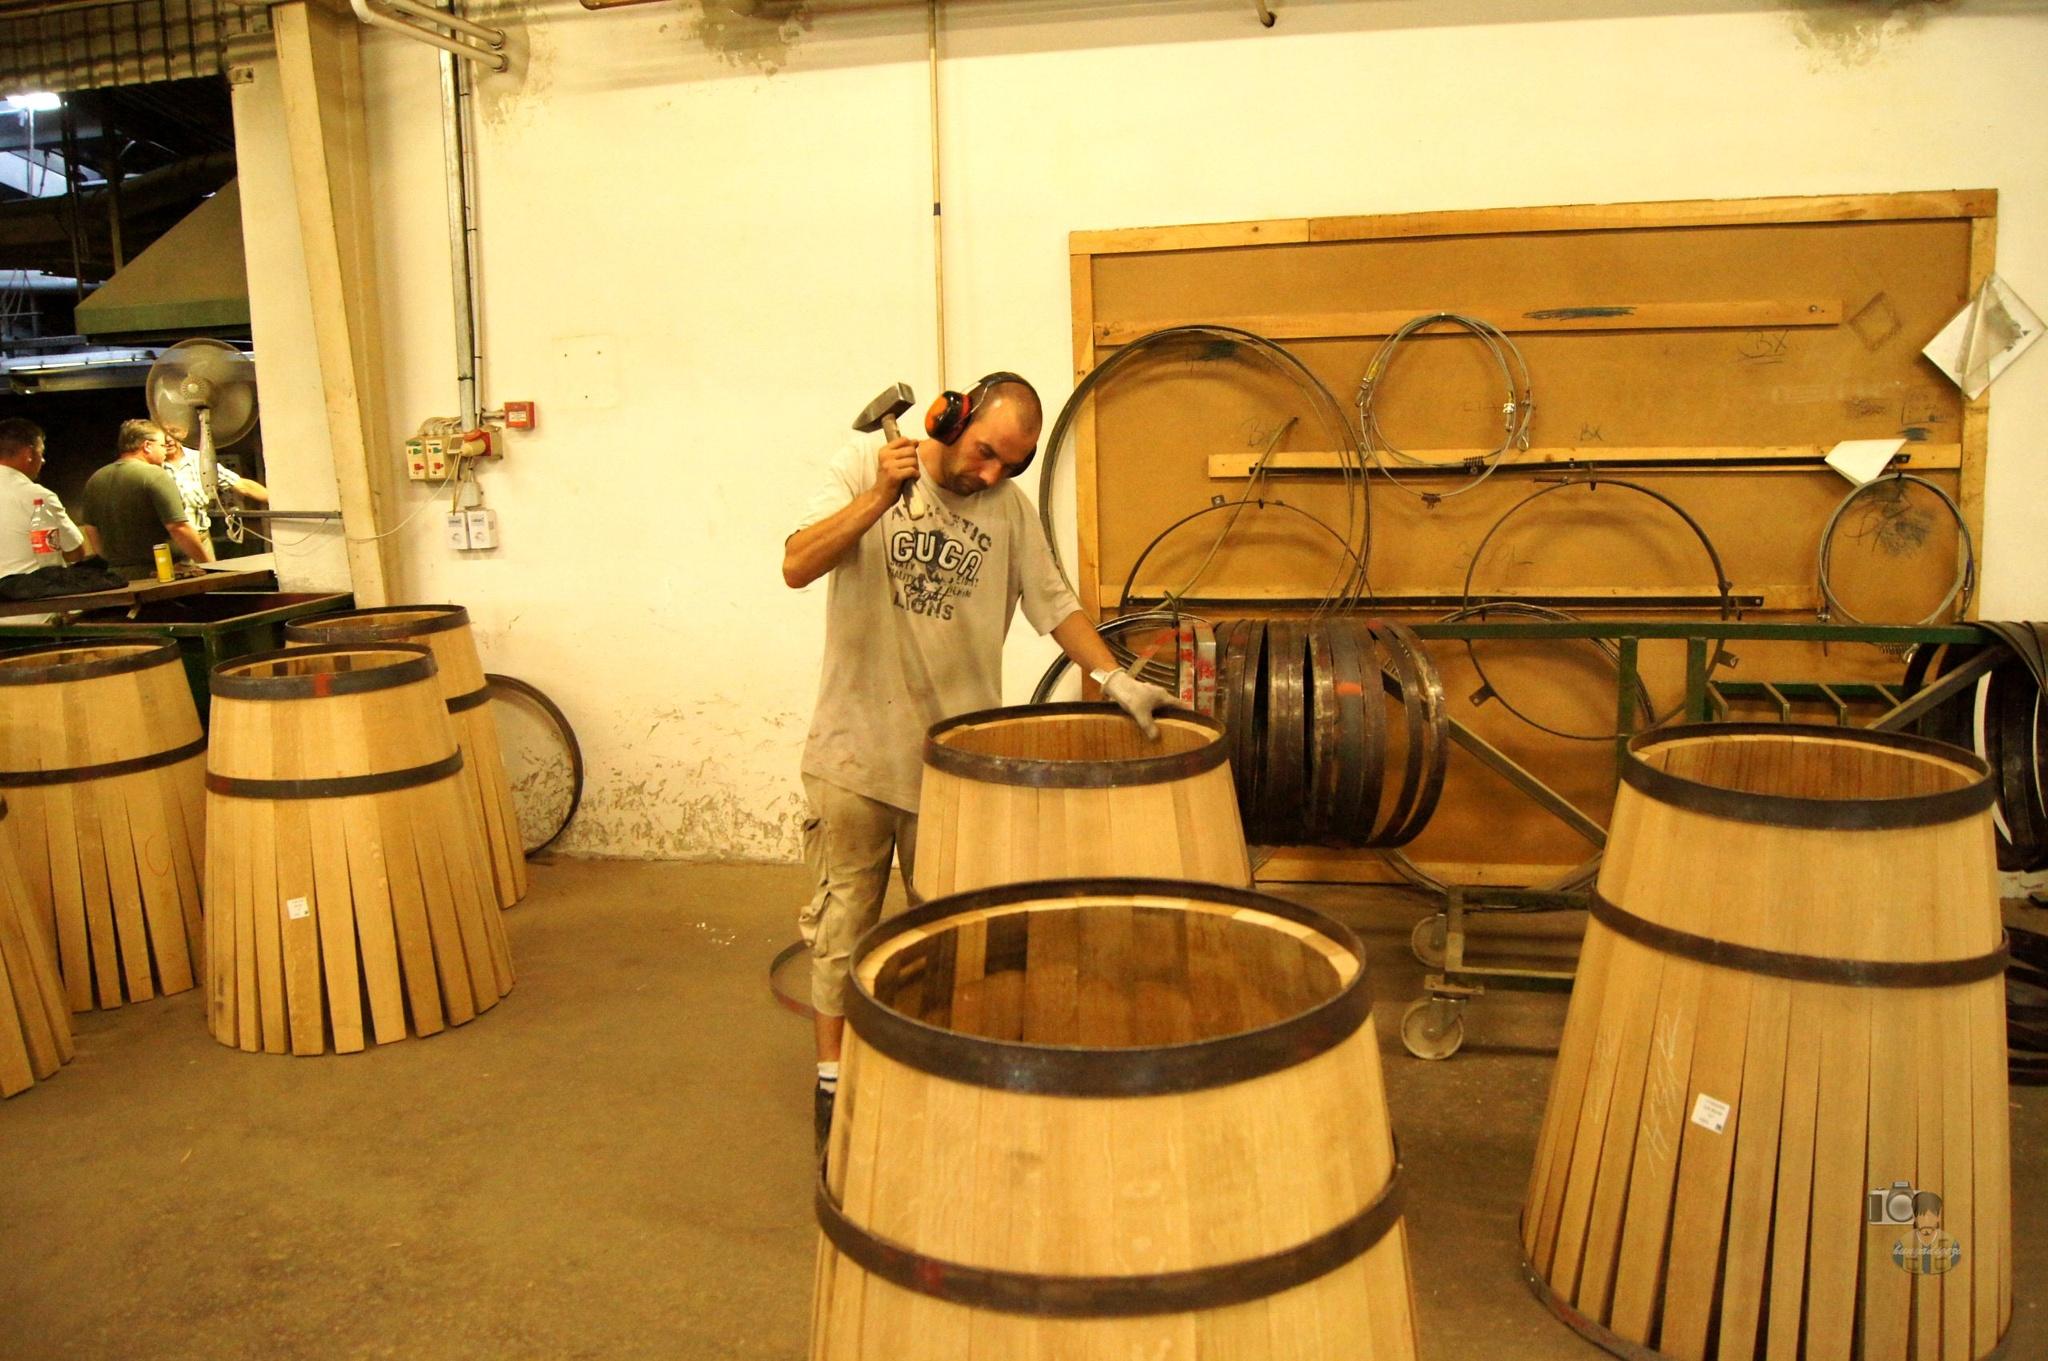 oak wine barrel production Szigetvár, Hungary #1 by hunyadigeza